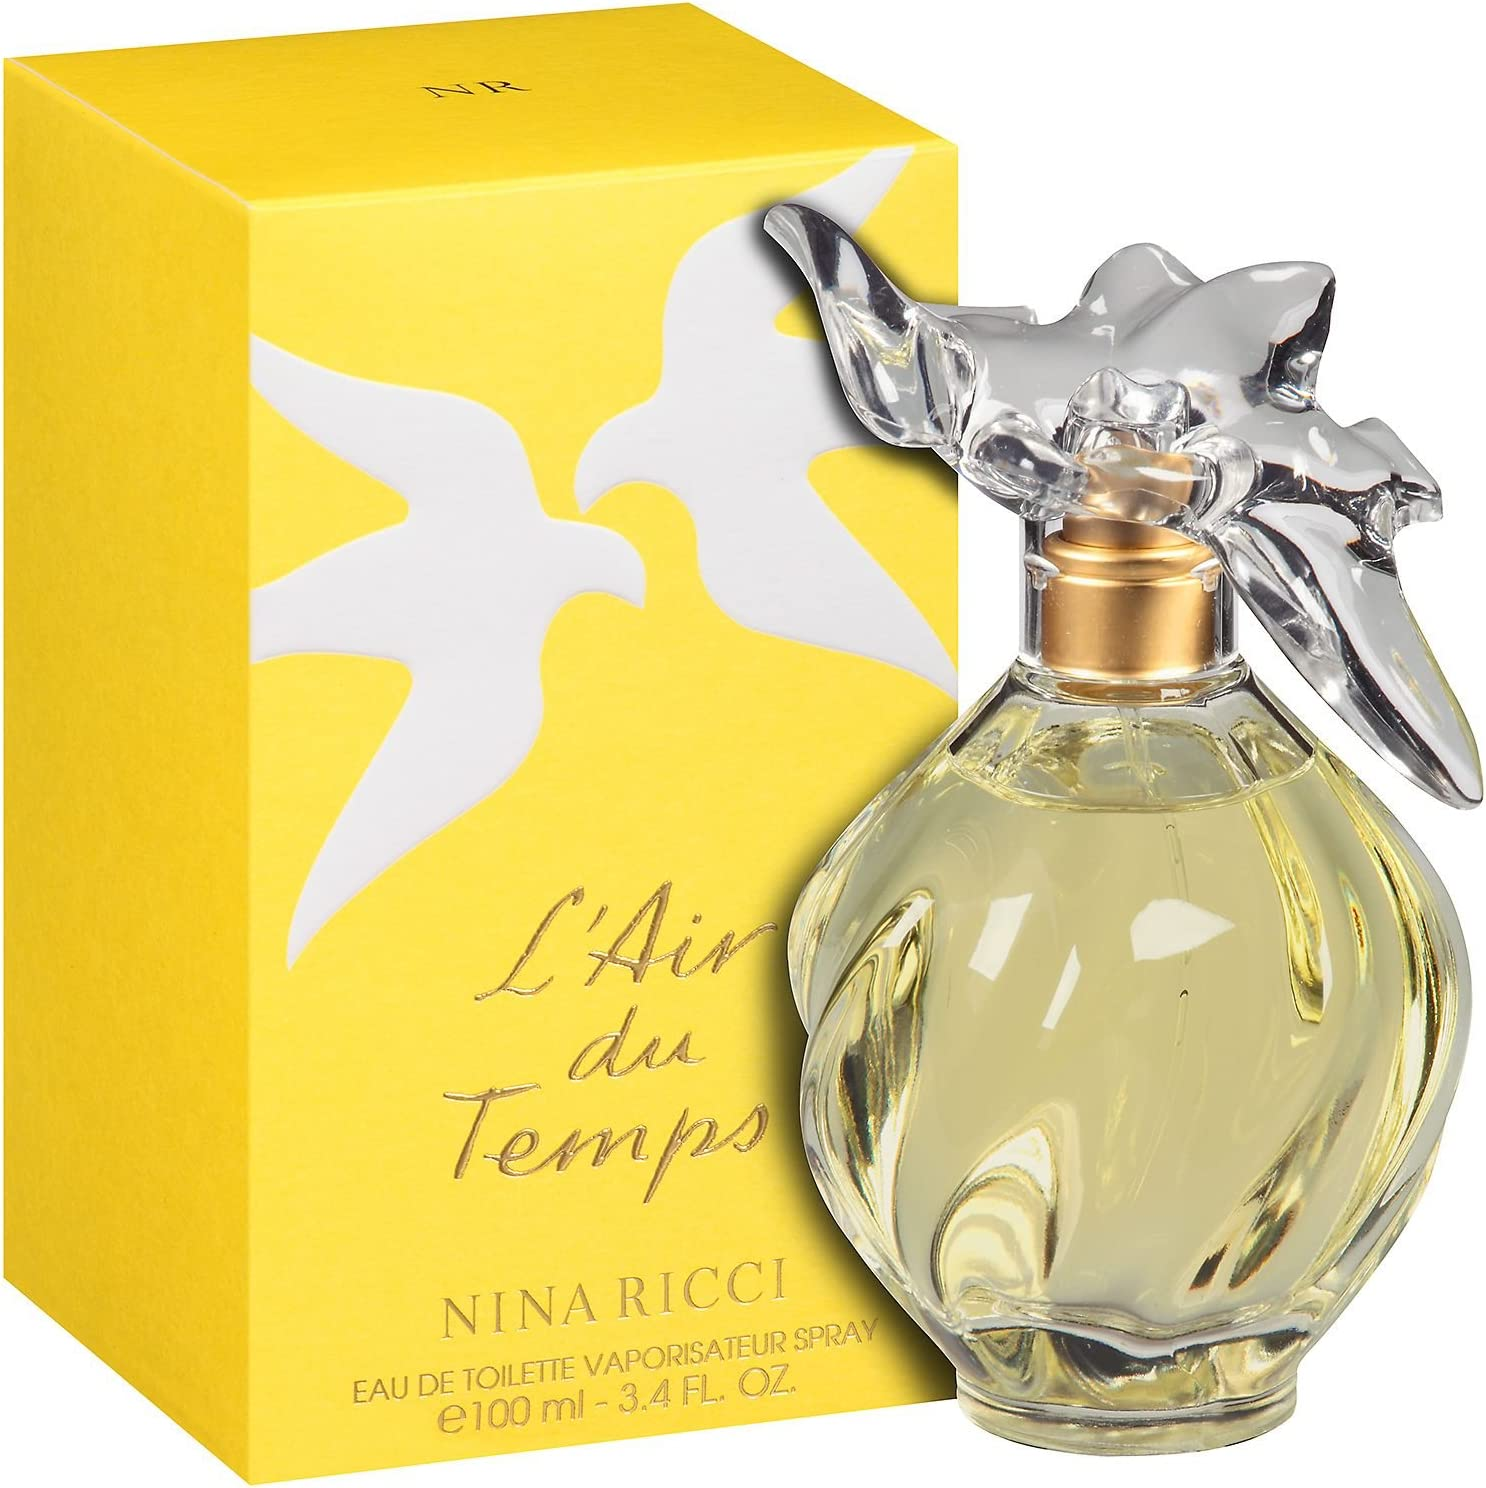 L'Air Du Temps FOR WOMEN by Nina Ricci 3.4 oz EDT Spray by Nina Ricci